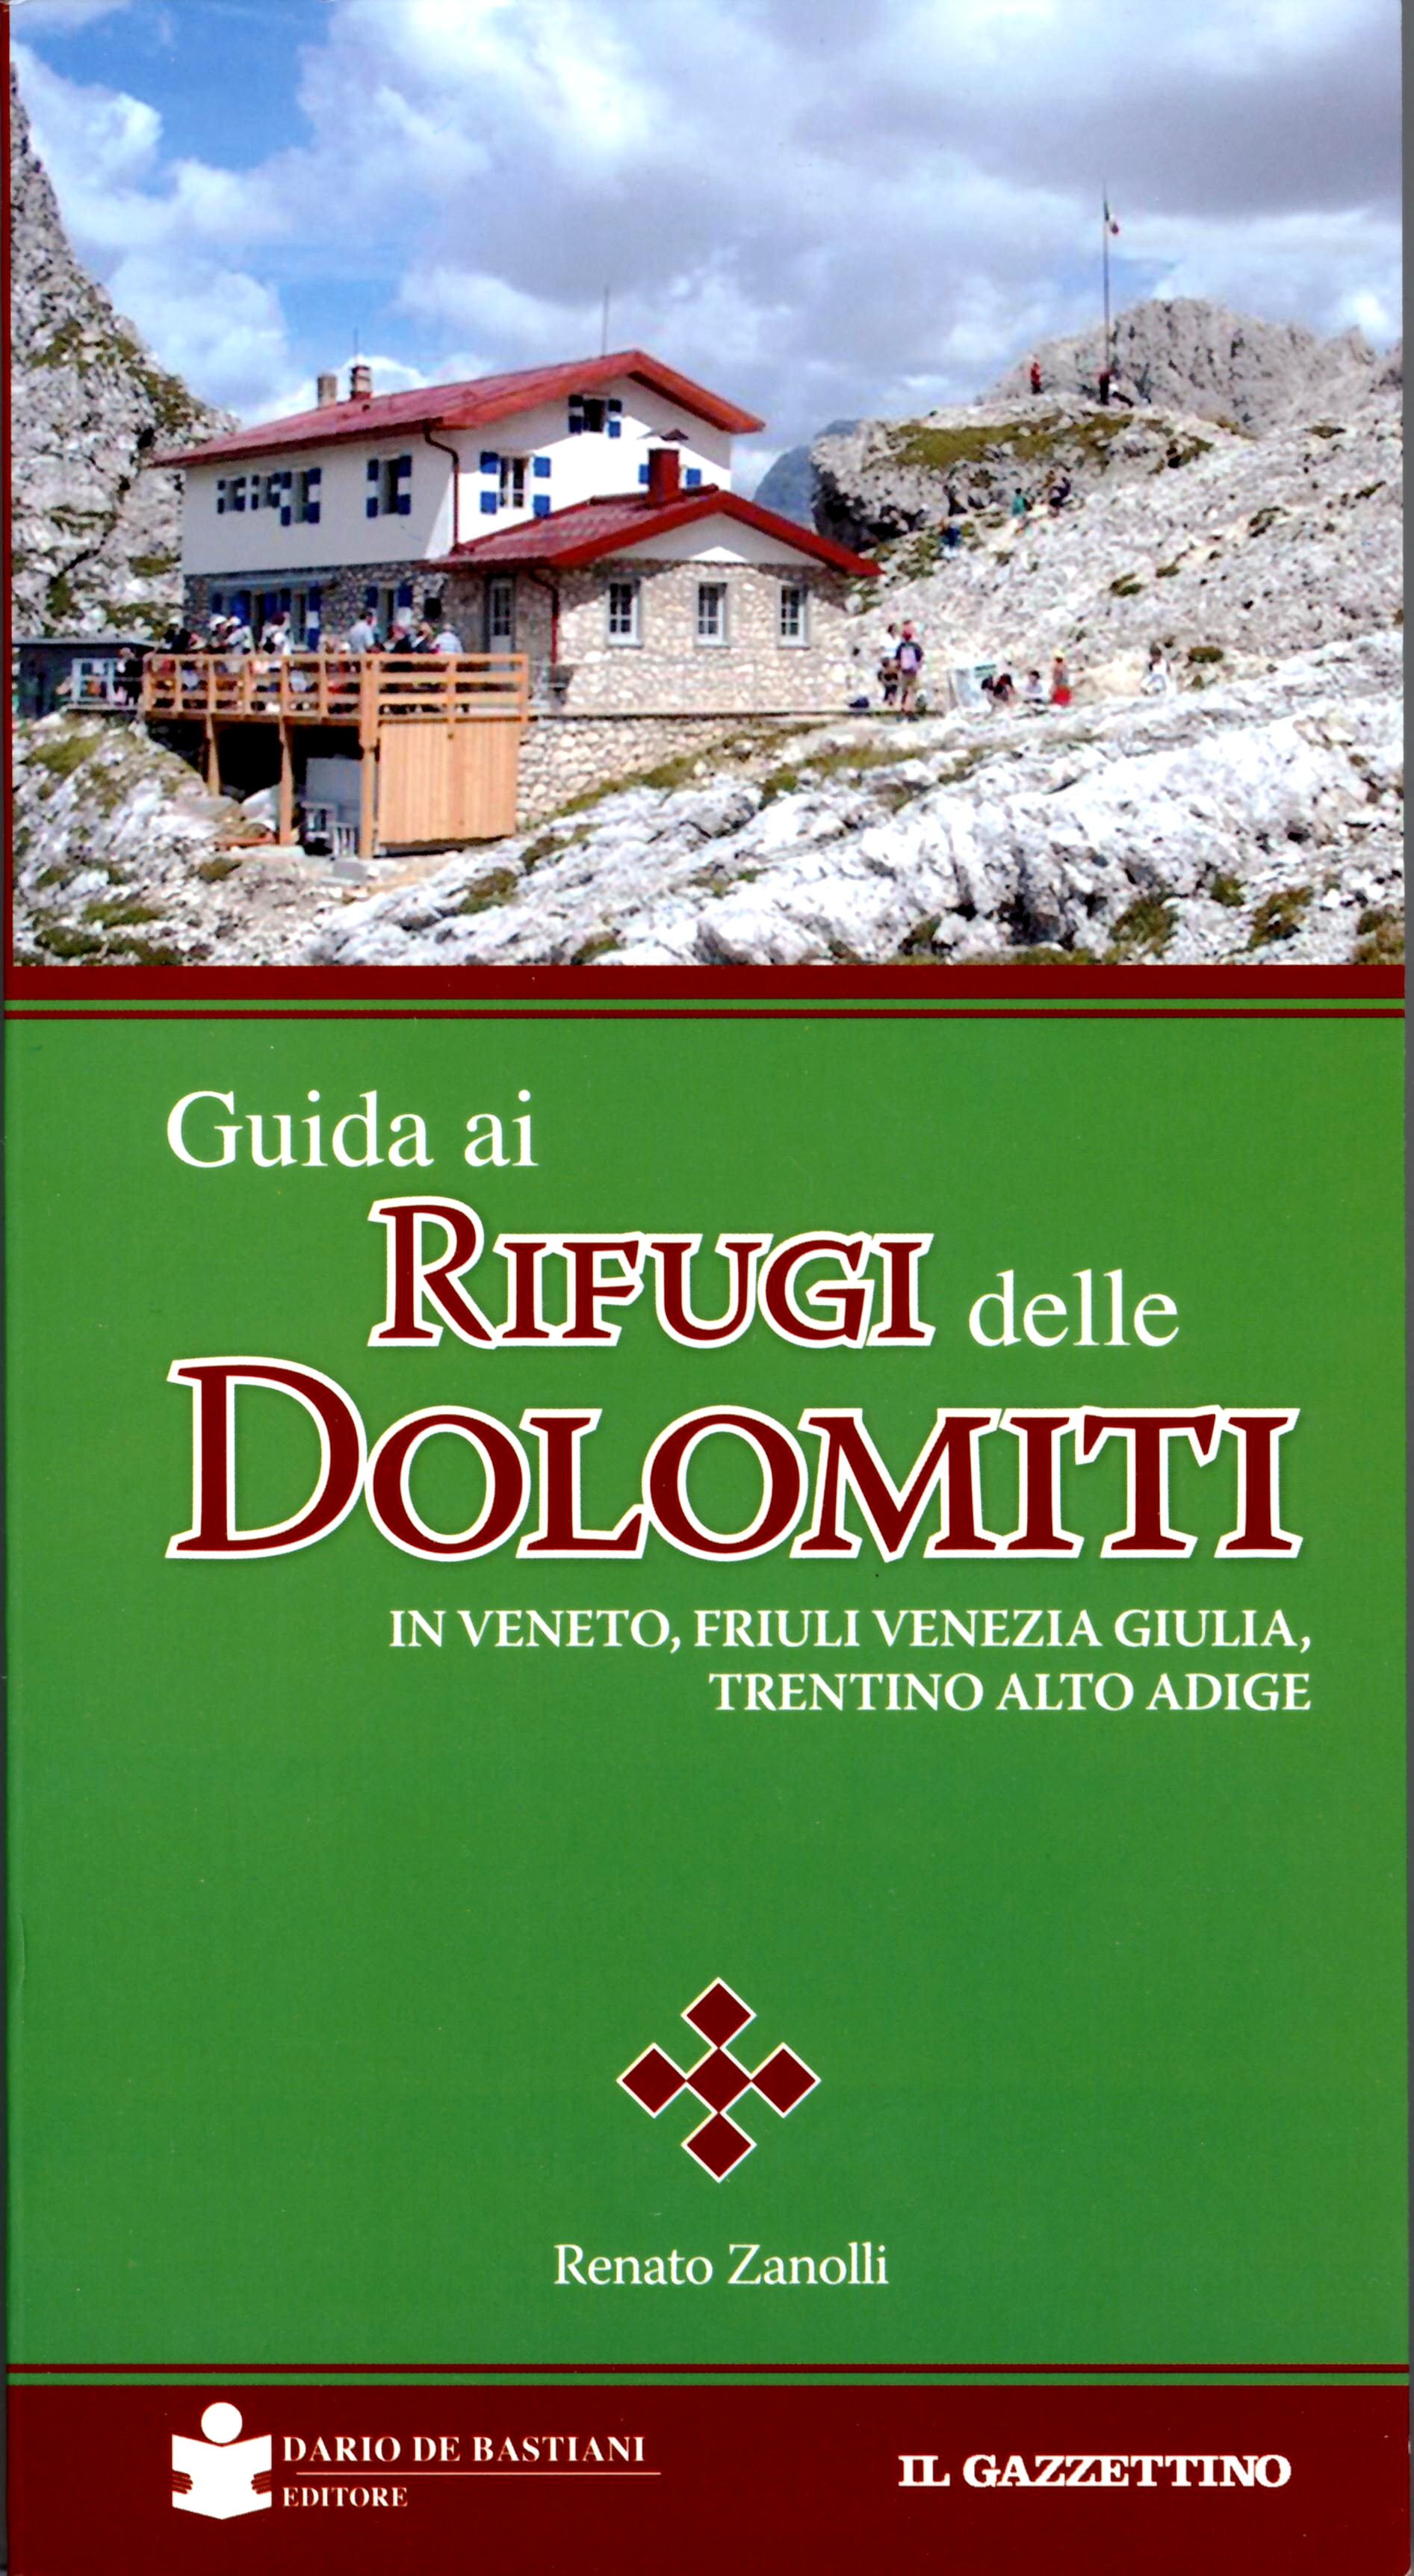 Guida ai Rifugi delle Dolomiti